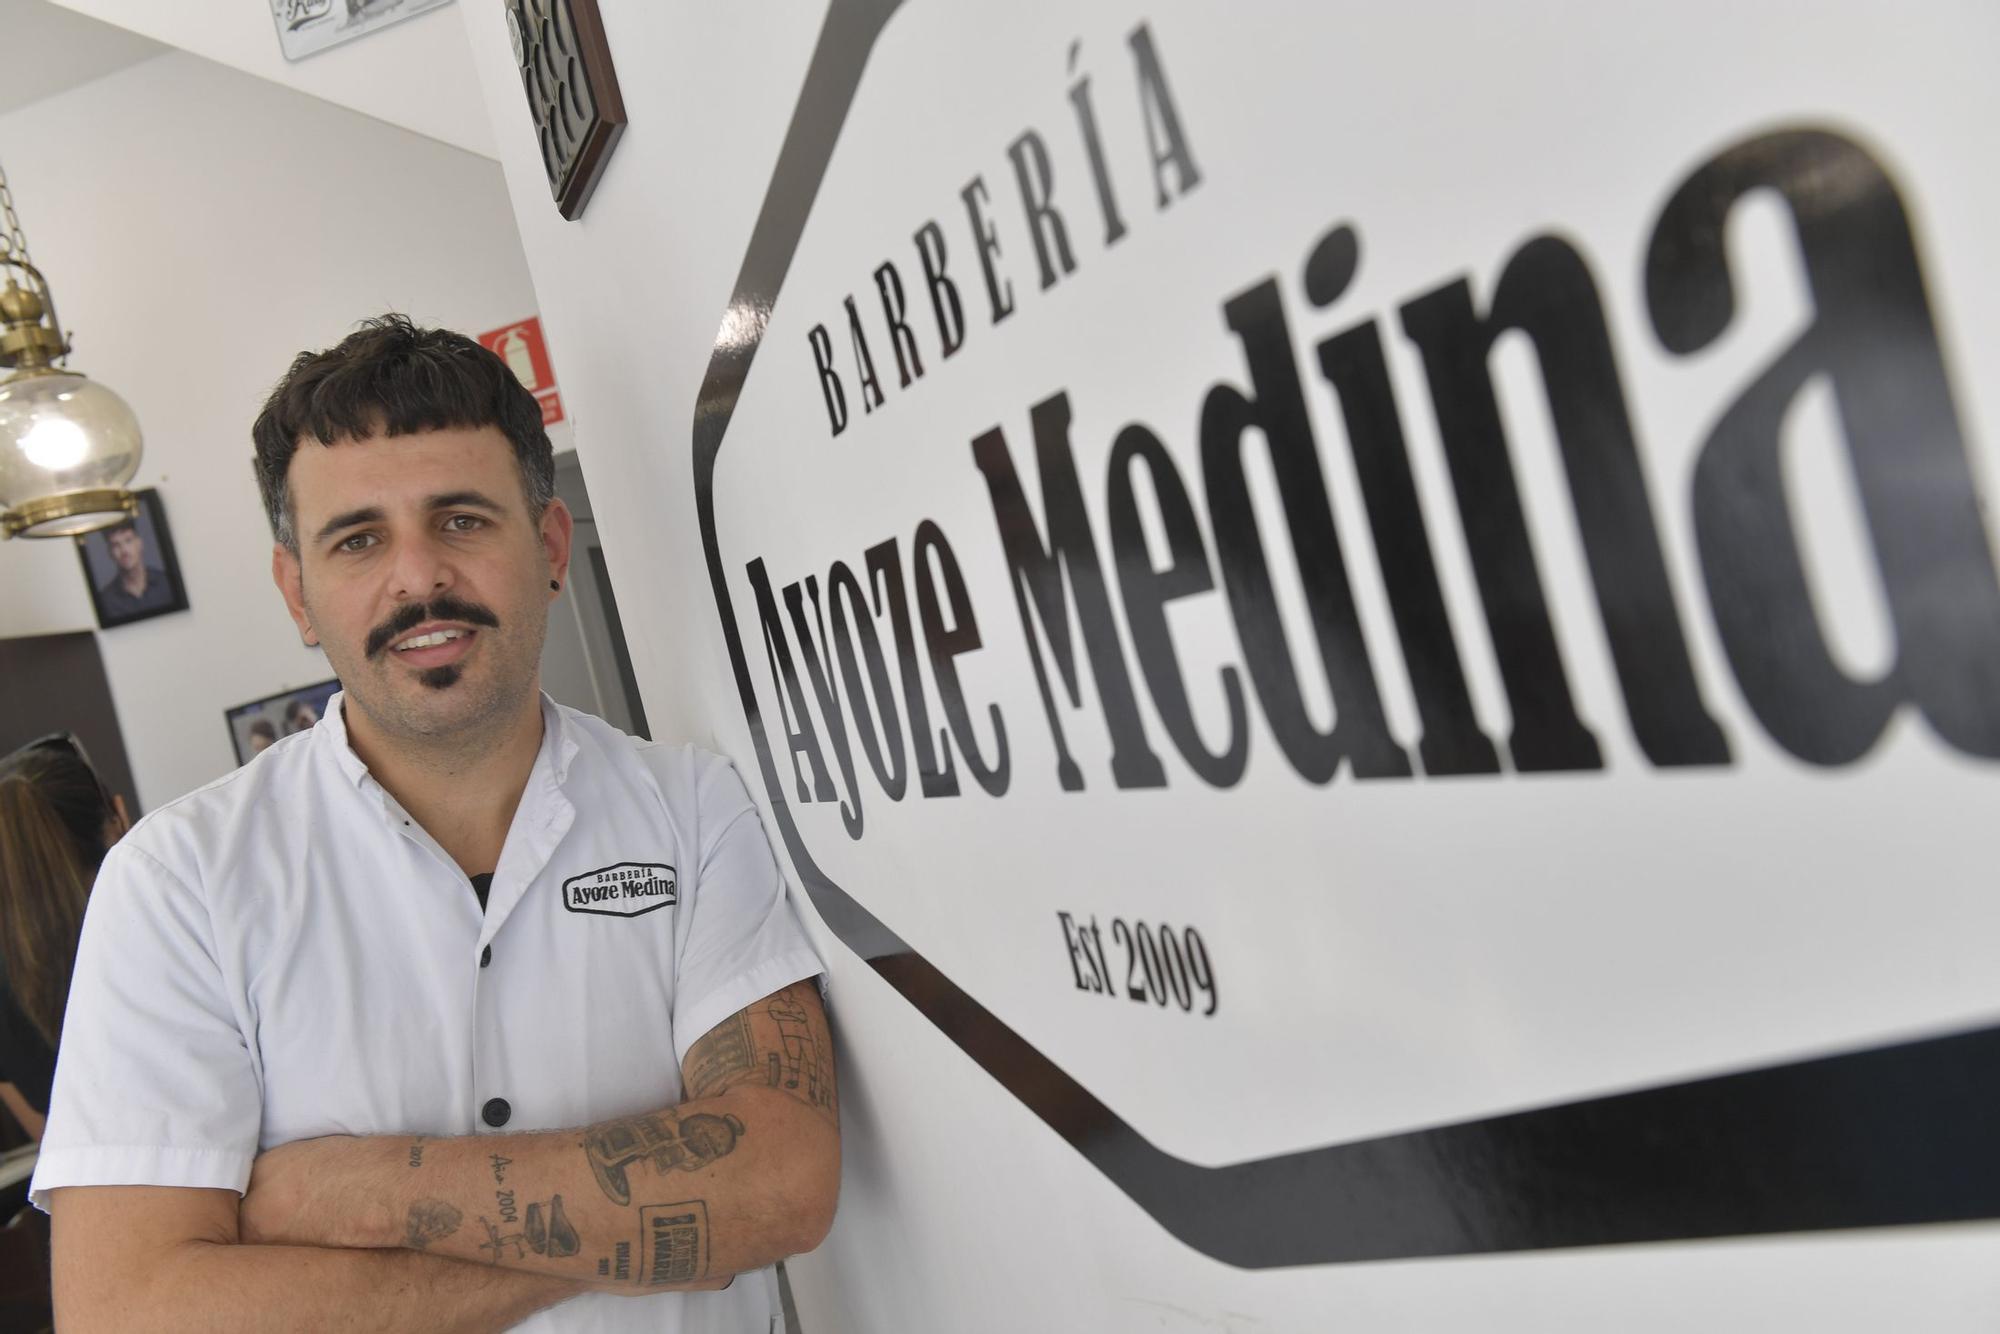 Ayoze Medina, subcampeón internacional de peluquería